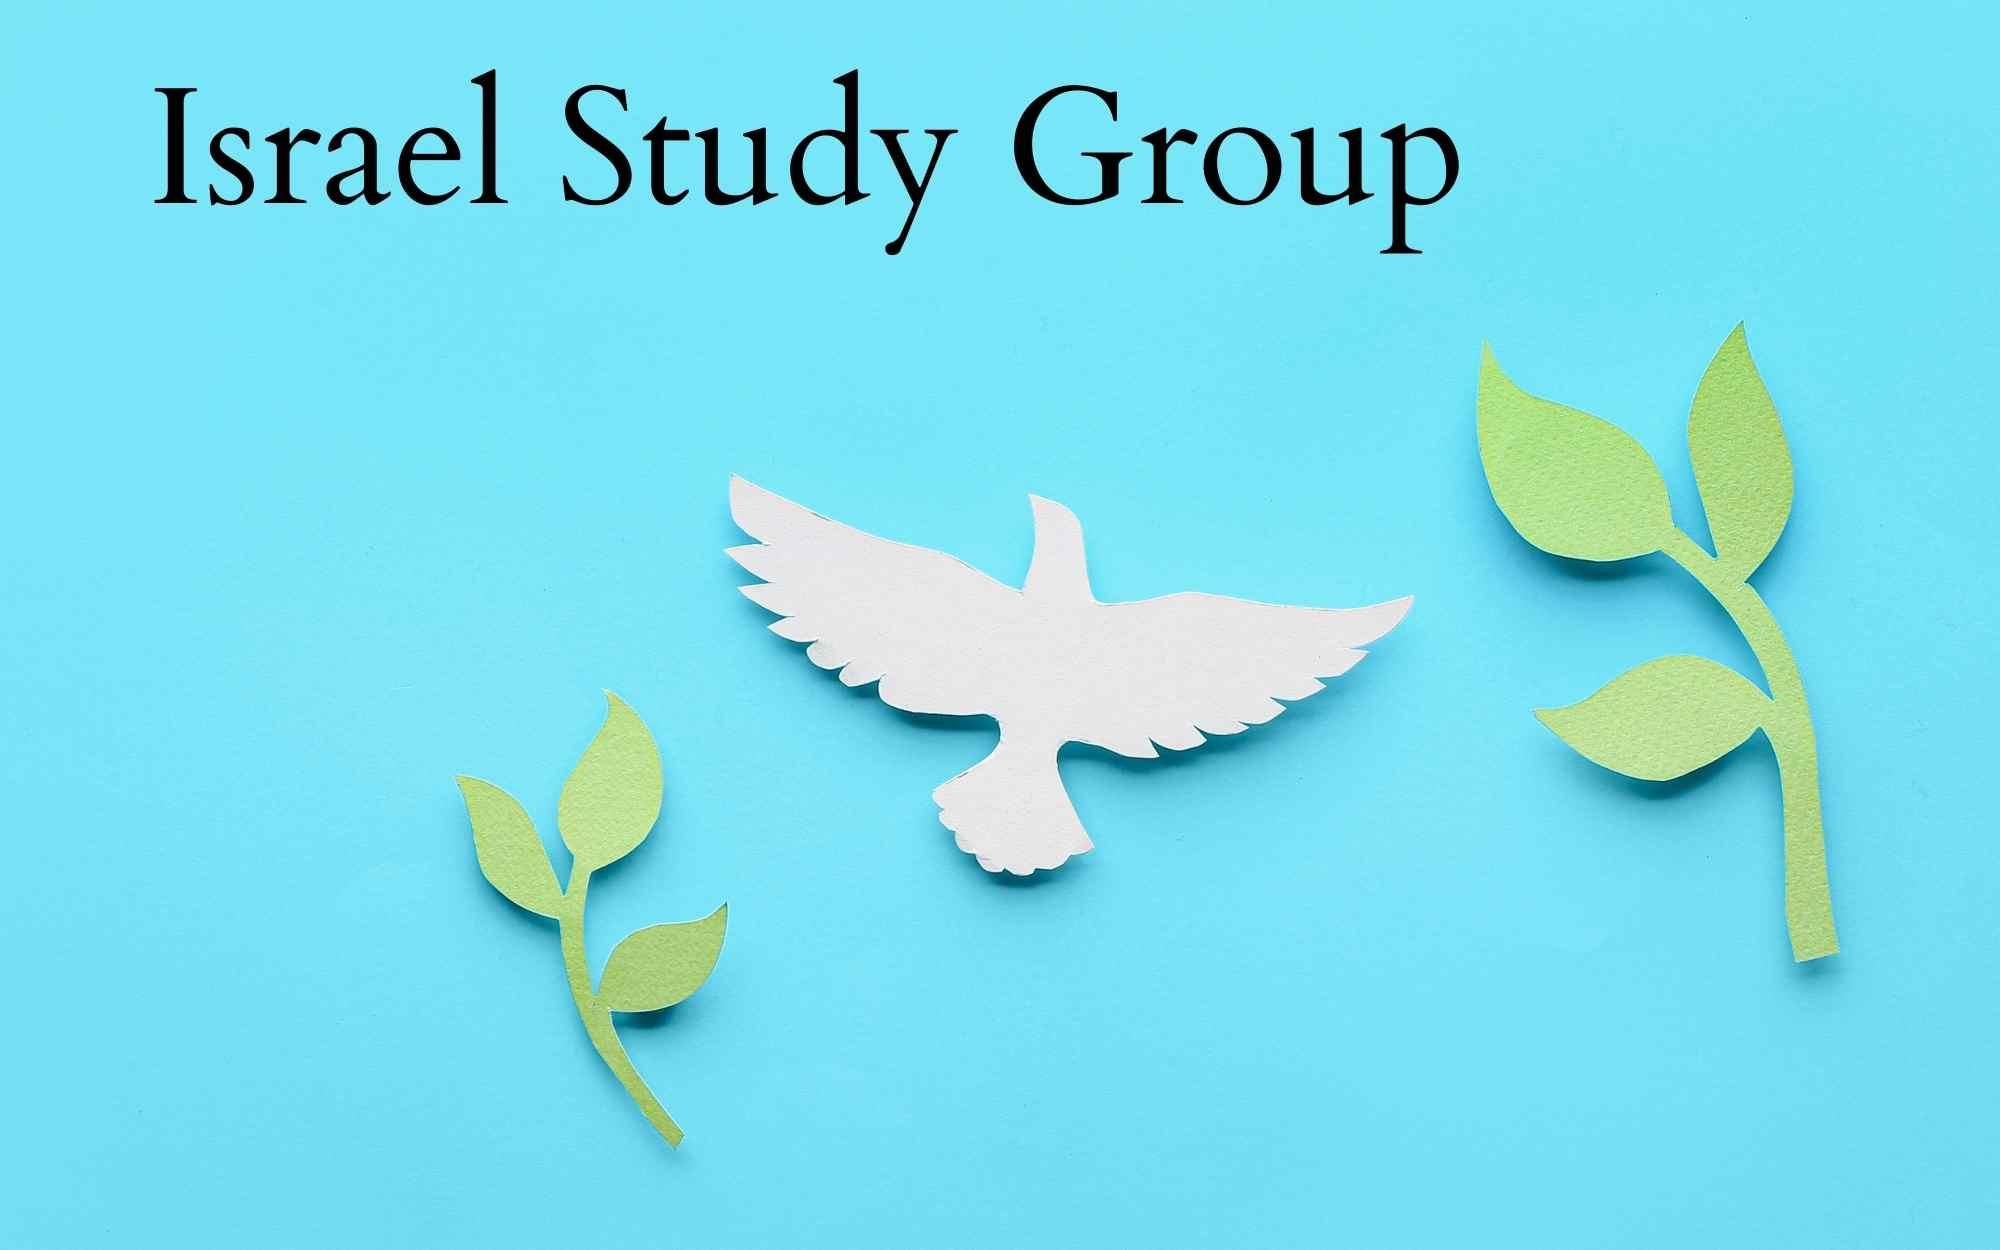 Israel Study Group